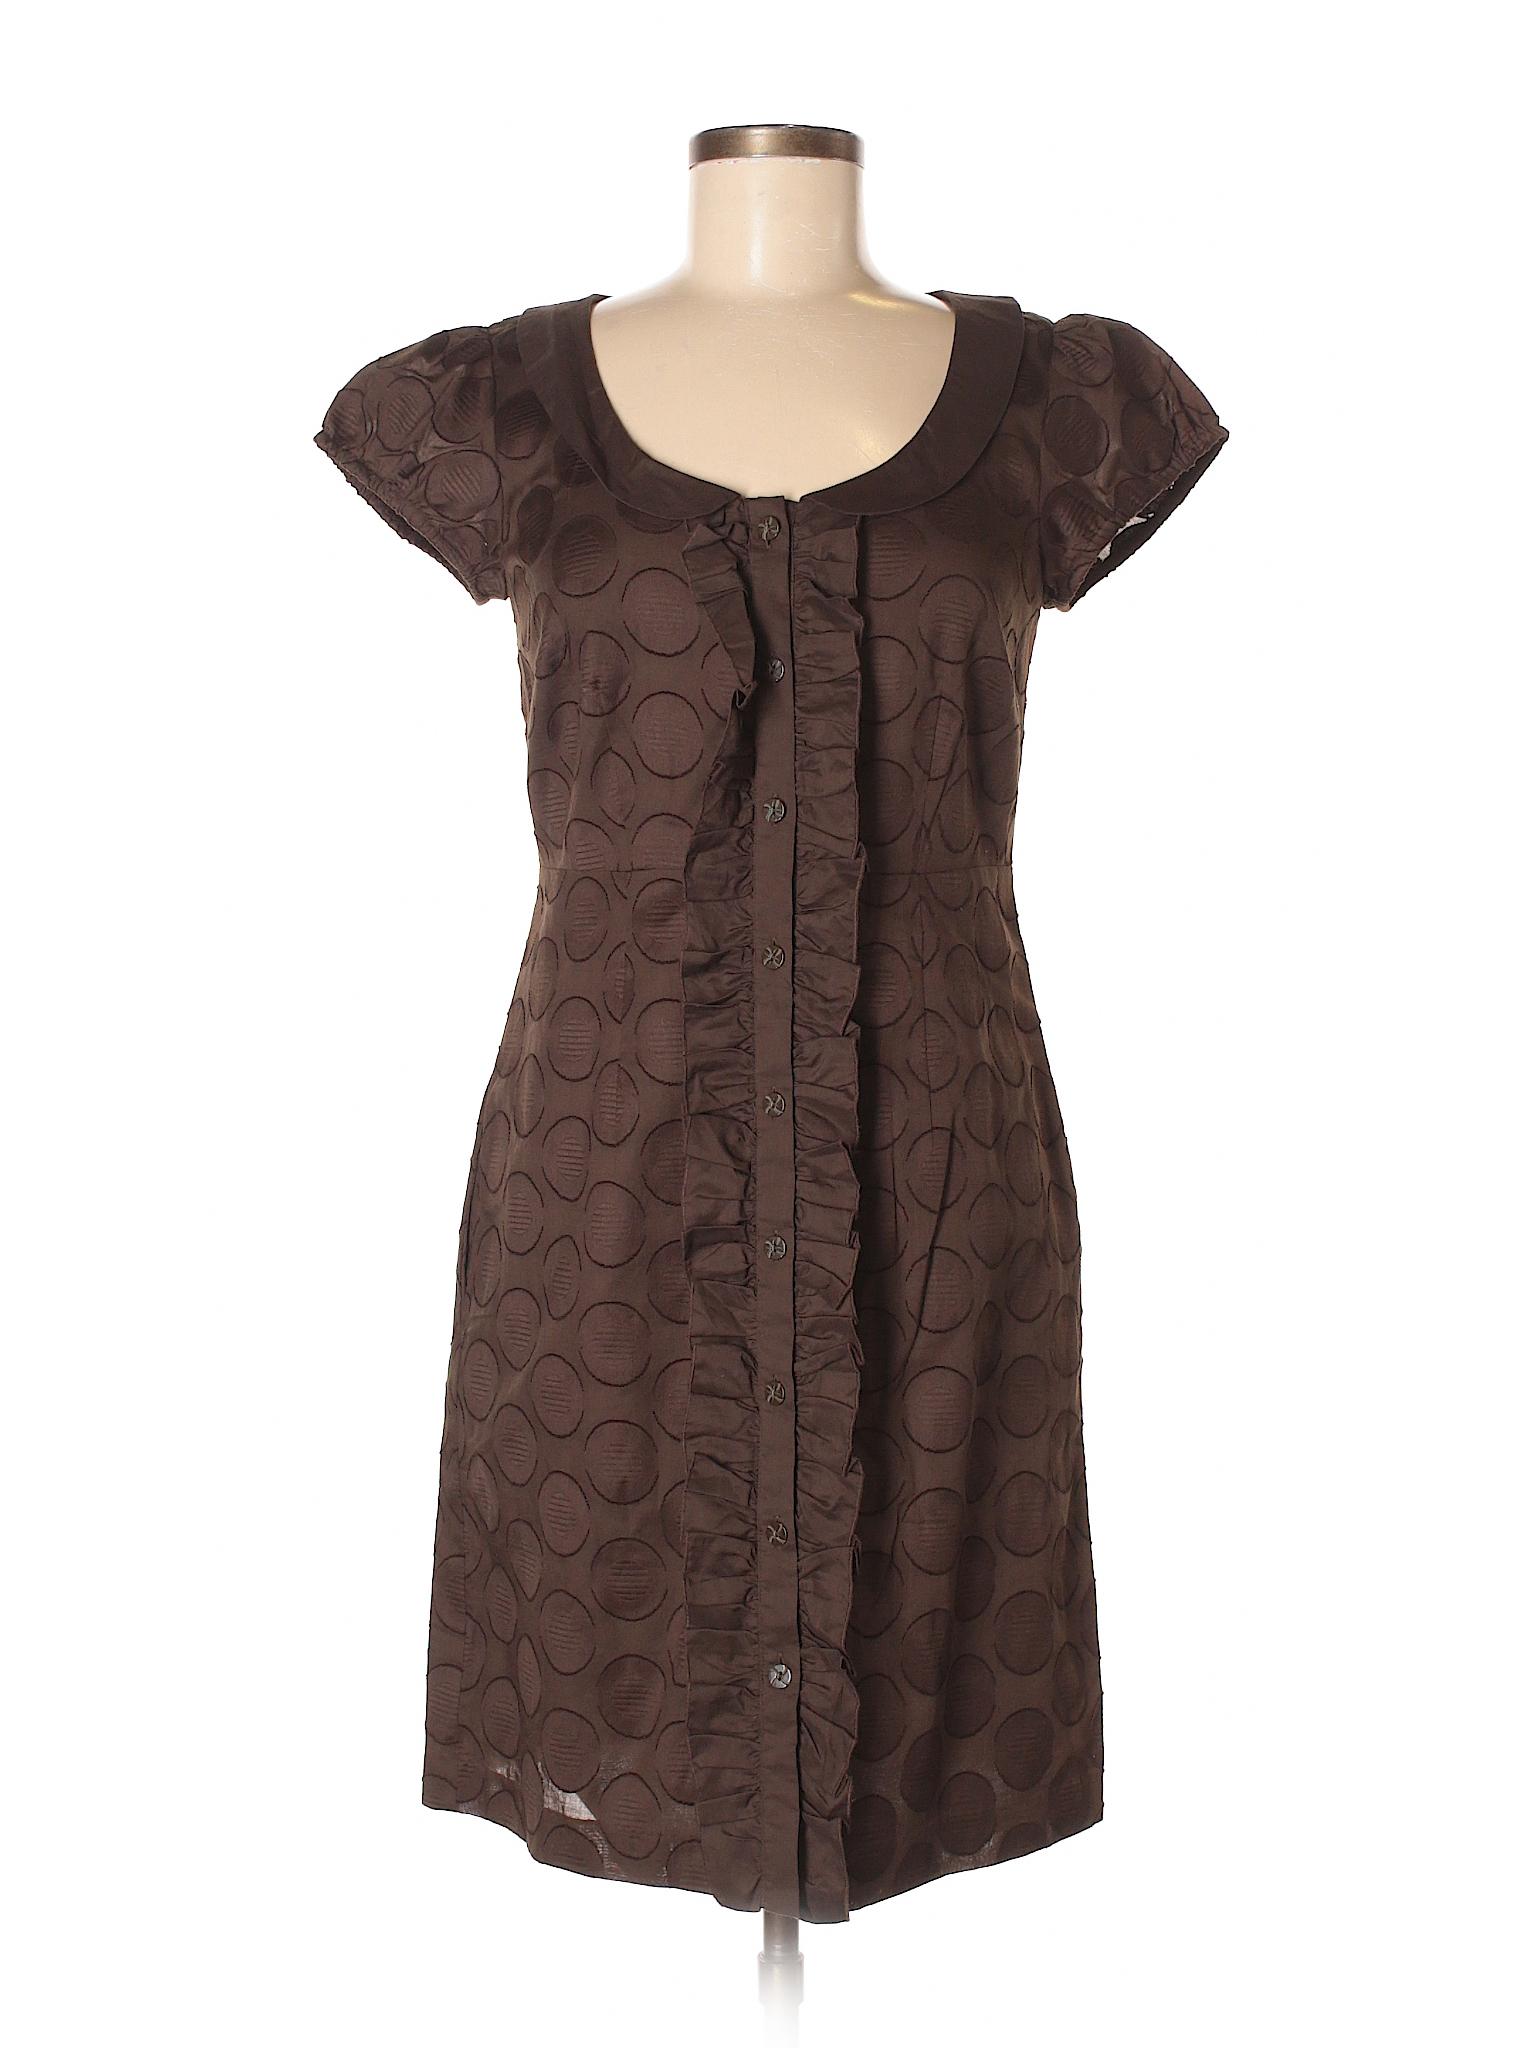 Outlet Boutique Ann Dress winter LOFT Taylor Casual RwgAaTq